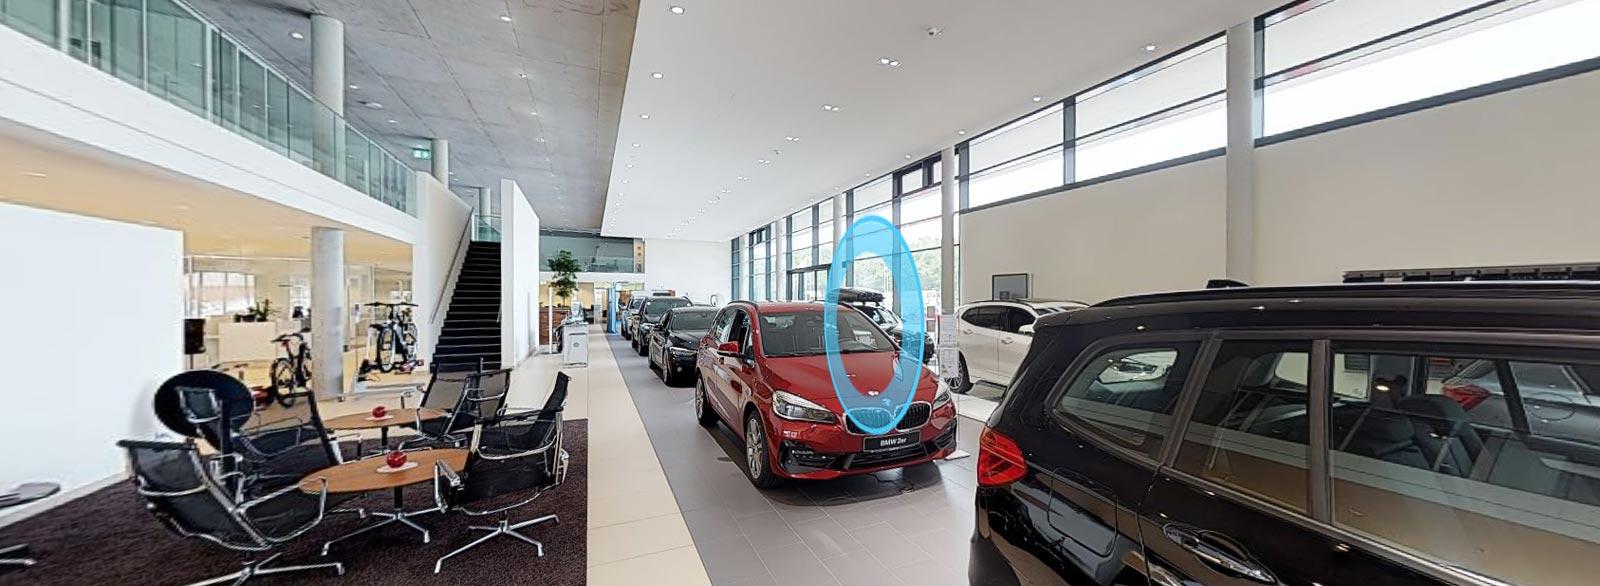 Virtueller Rundgang Autohaus Märtin